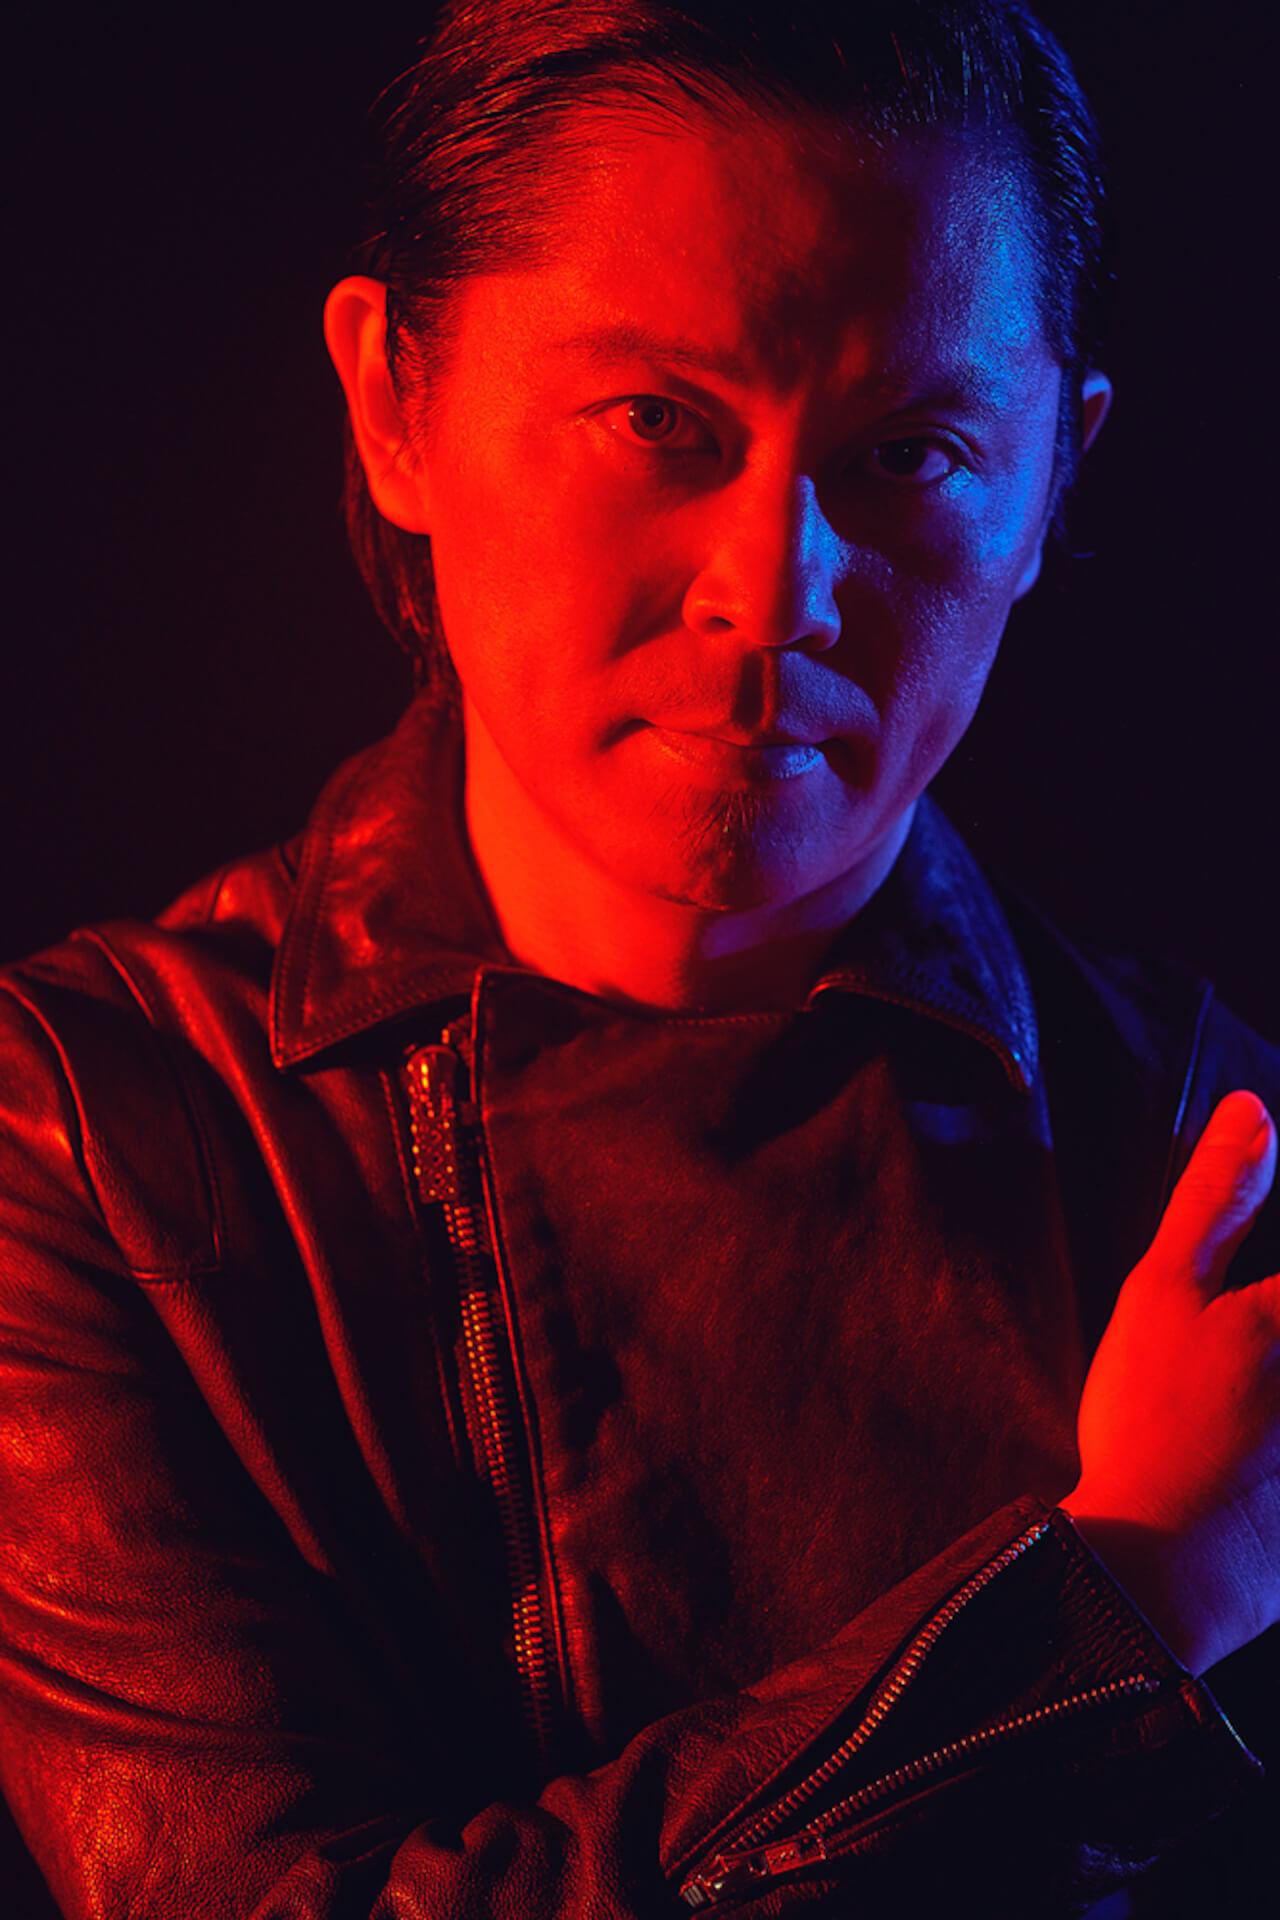 SUPER DOMMUNEにジェフ・ミルズ降臨!KEN ISHII新作アルバム特別番組が明日放送決定 music191126_superdommune_3